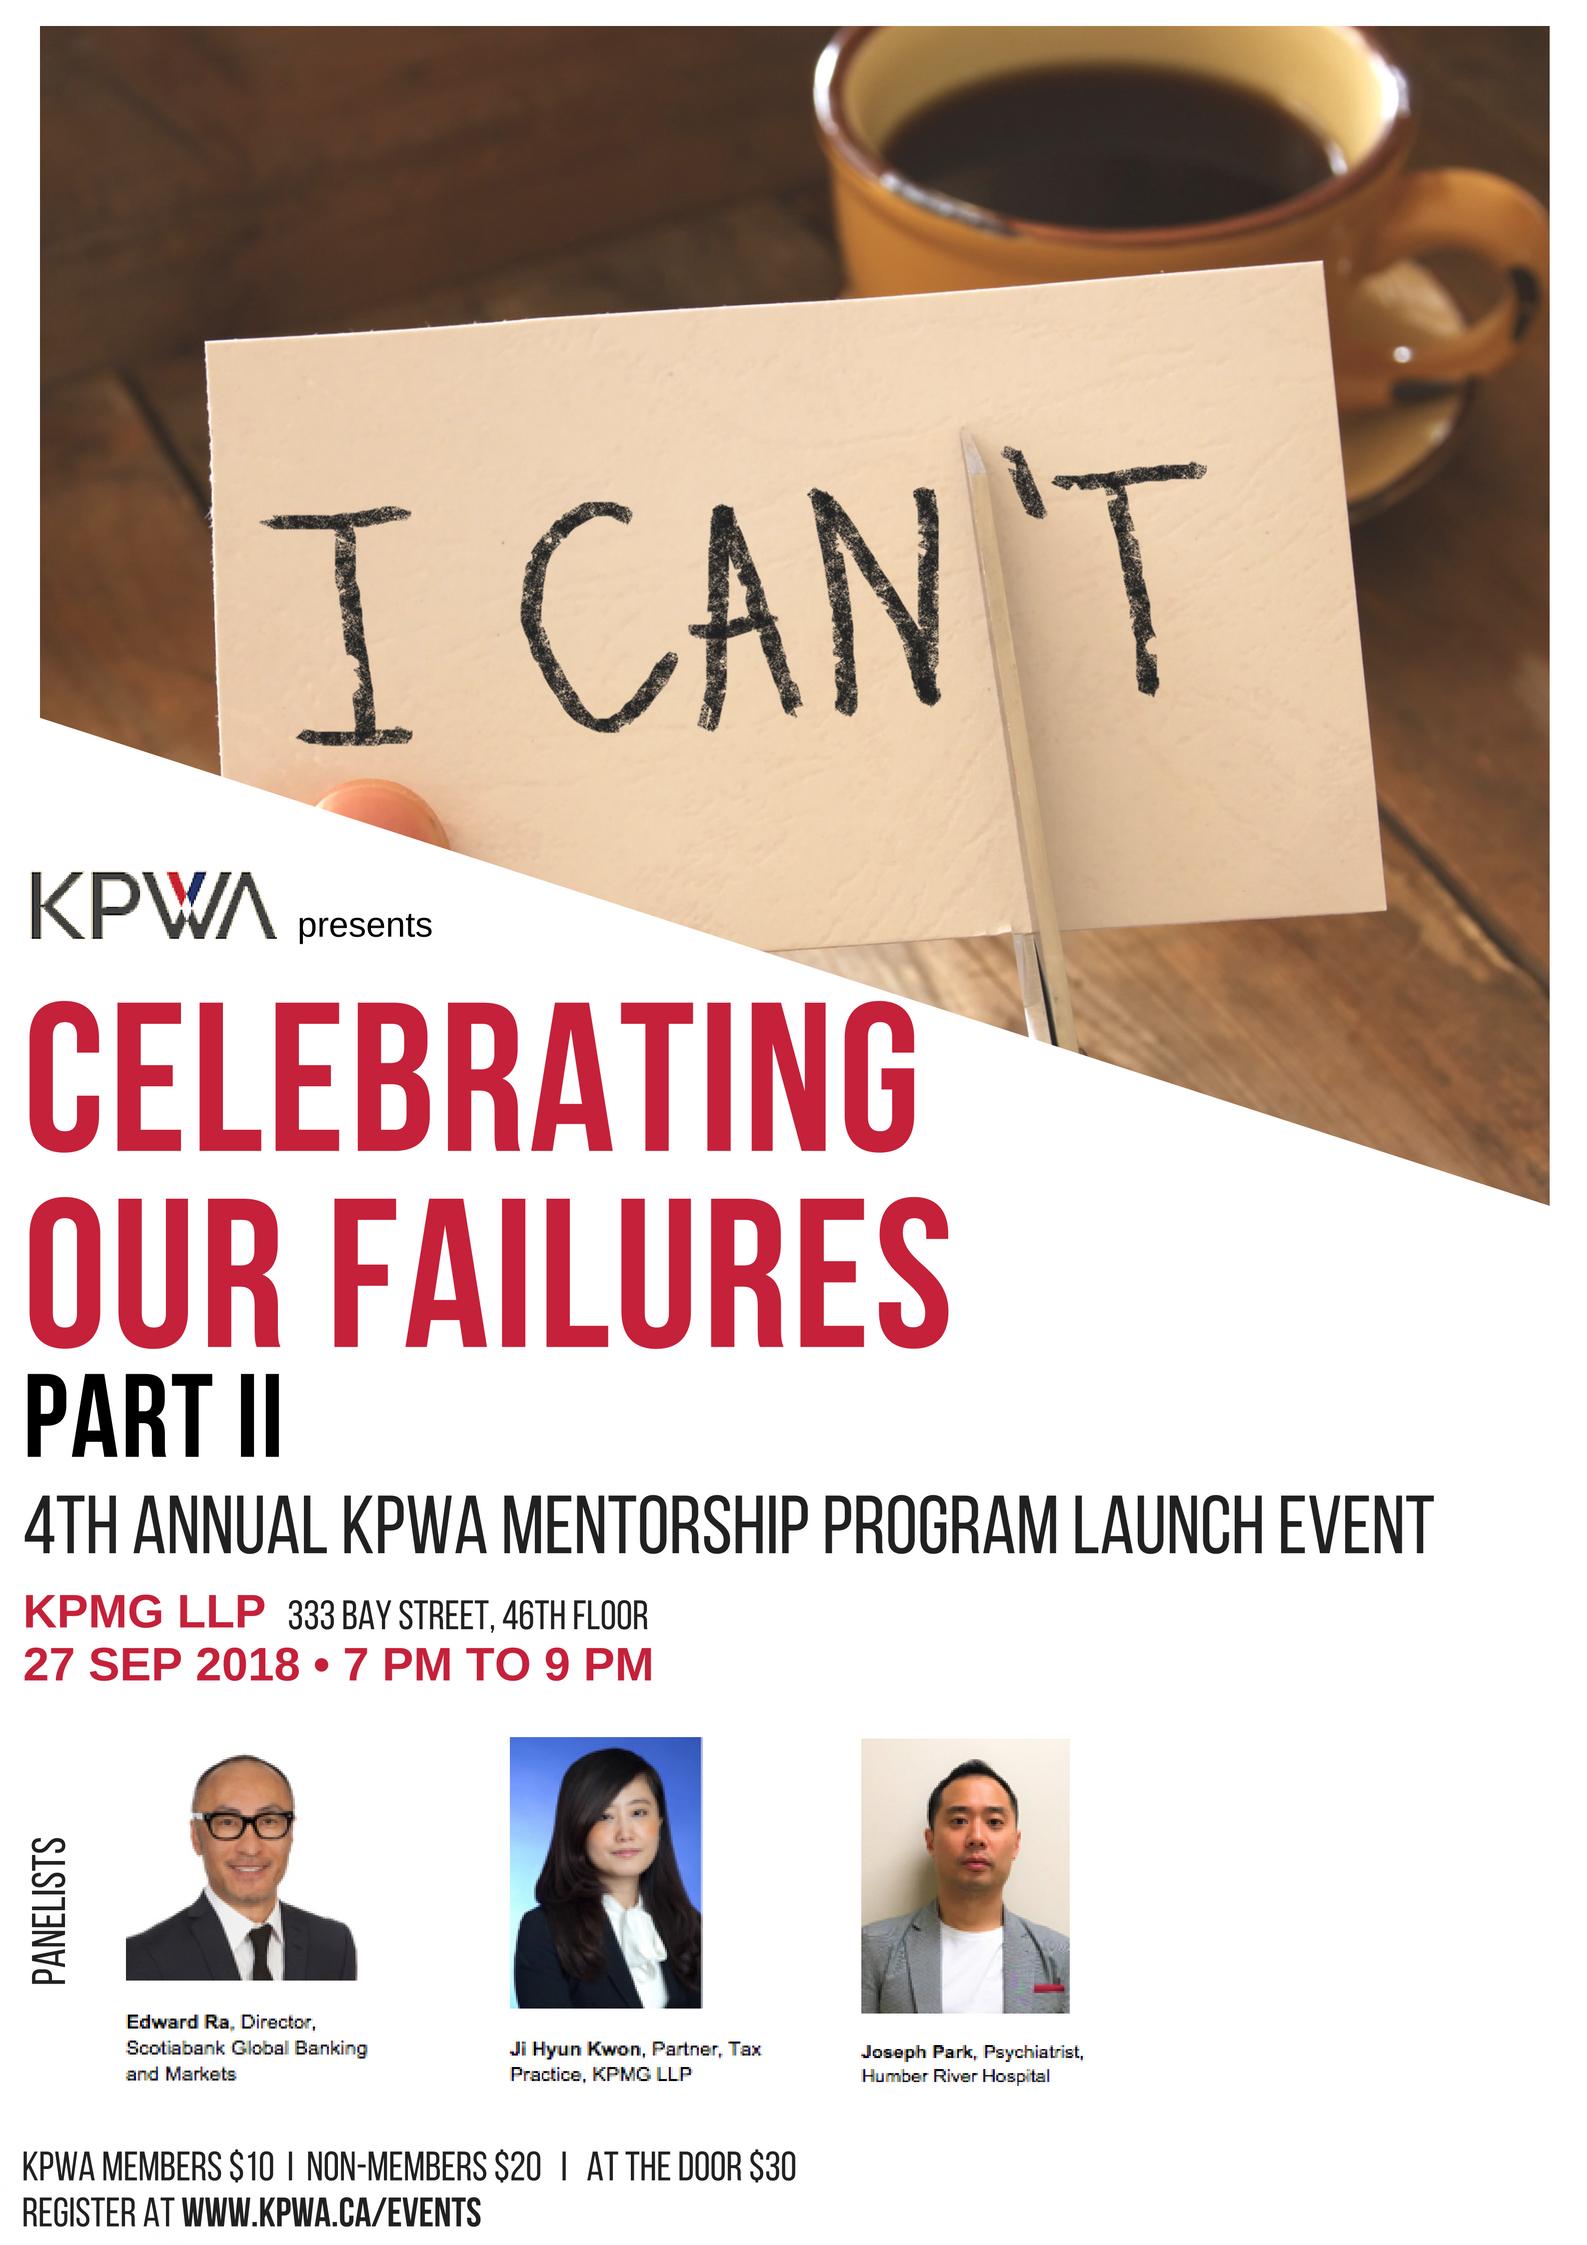 KPWA Mentorship Launch Event 2018